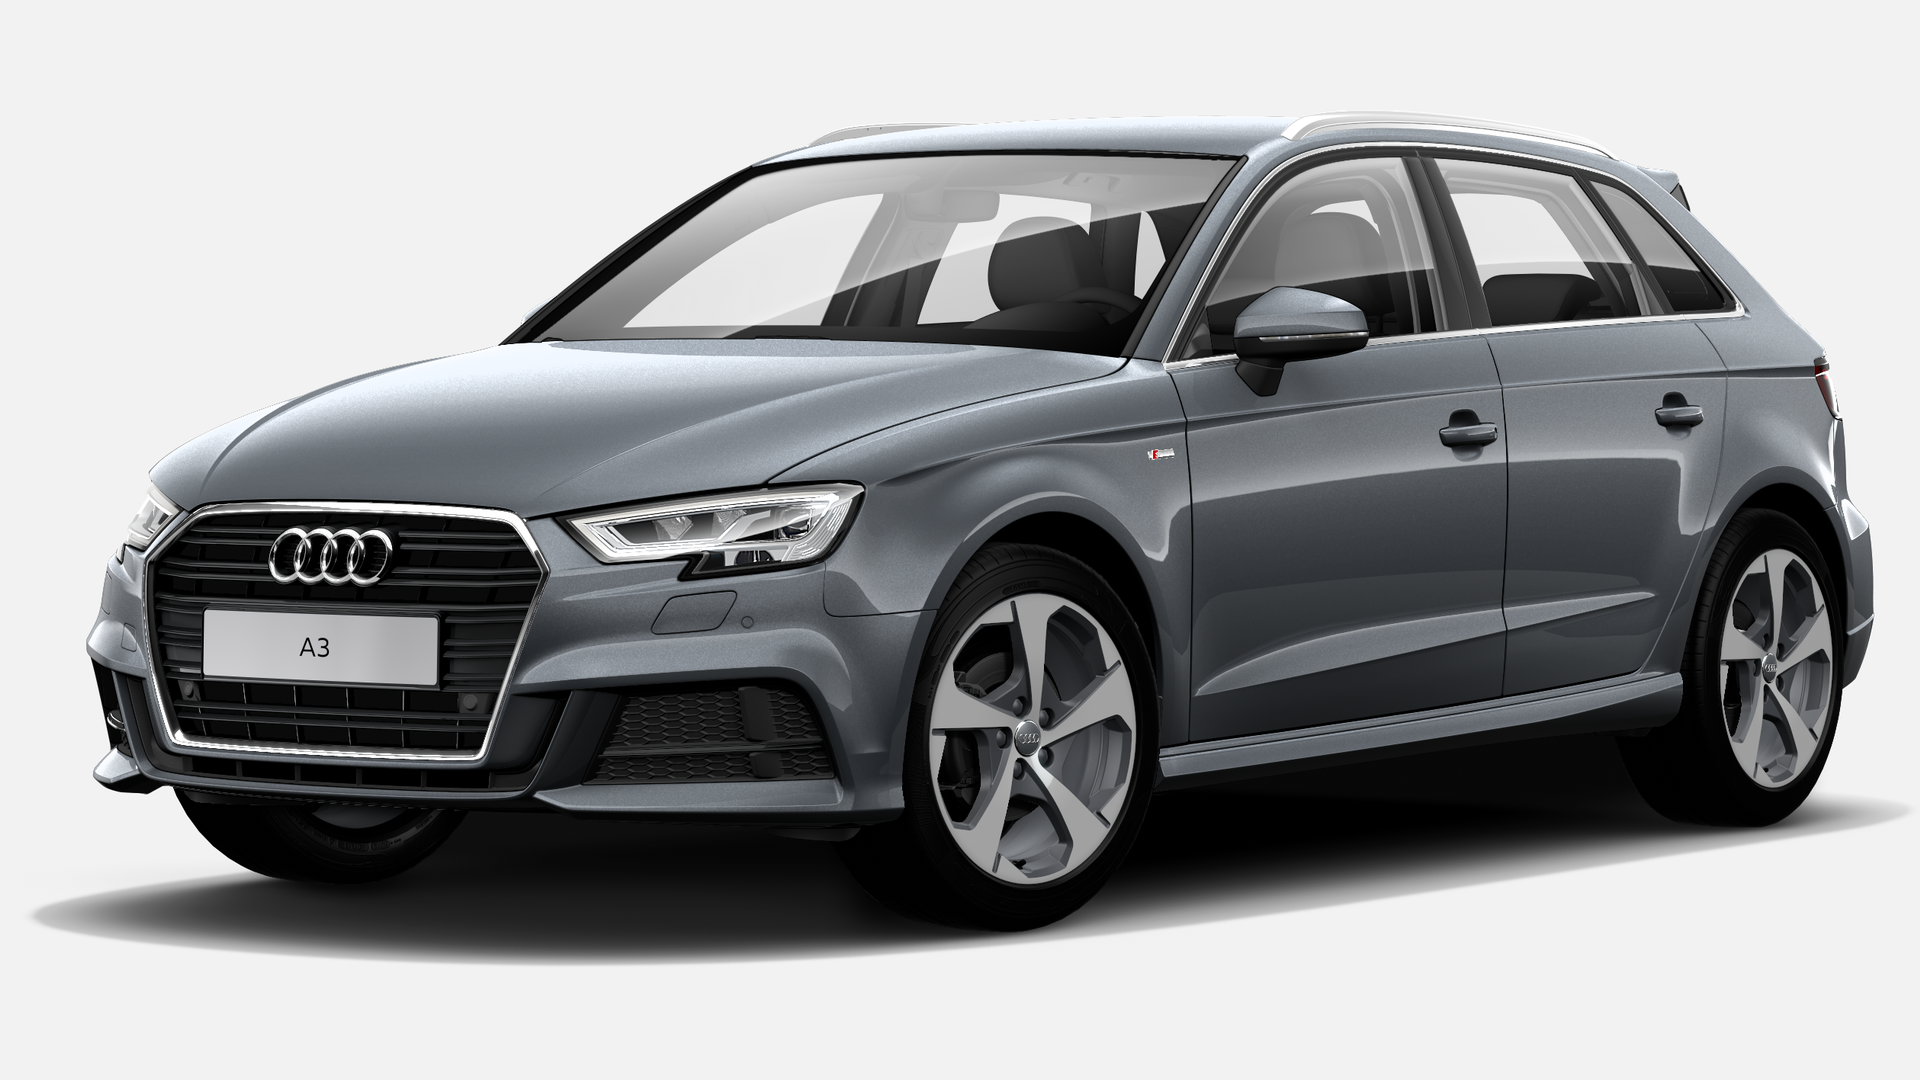 Audi A3 Sportback 35 TFSI CoD S line 110 kW (150 CV)  nuevo en Lugo